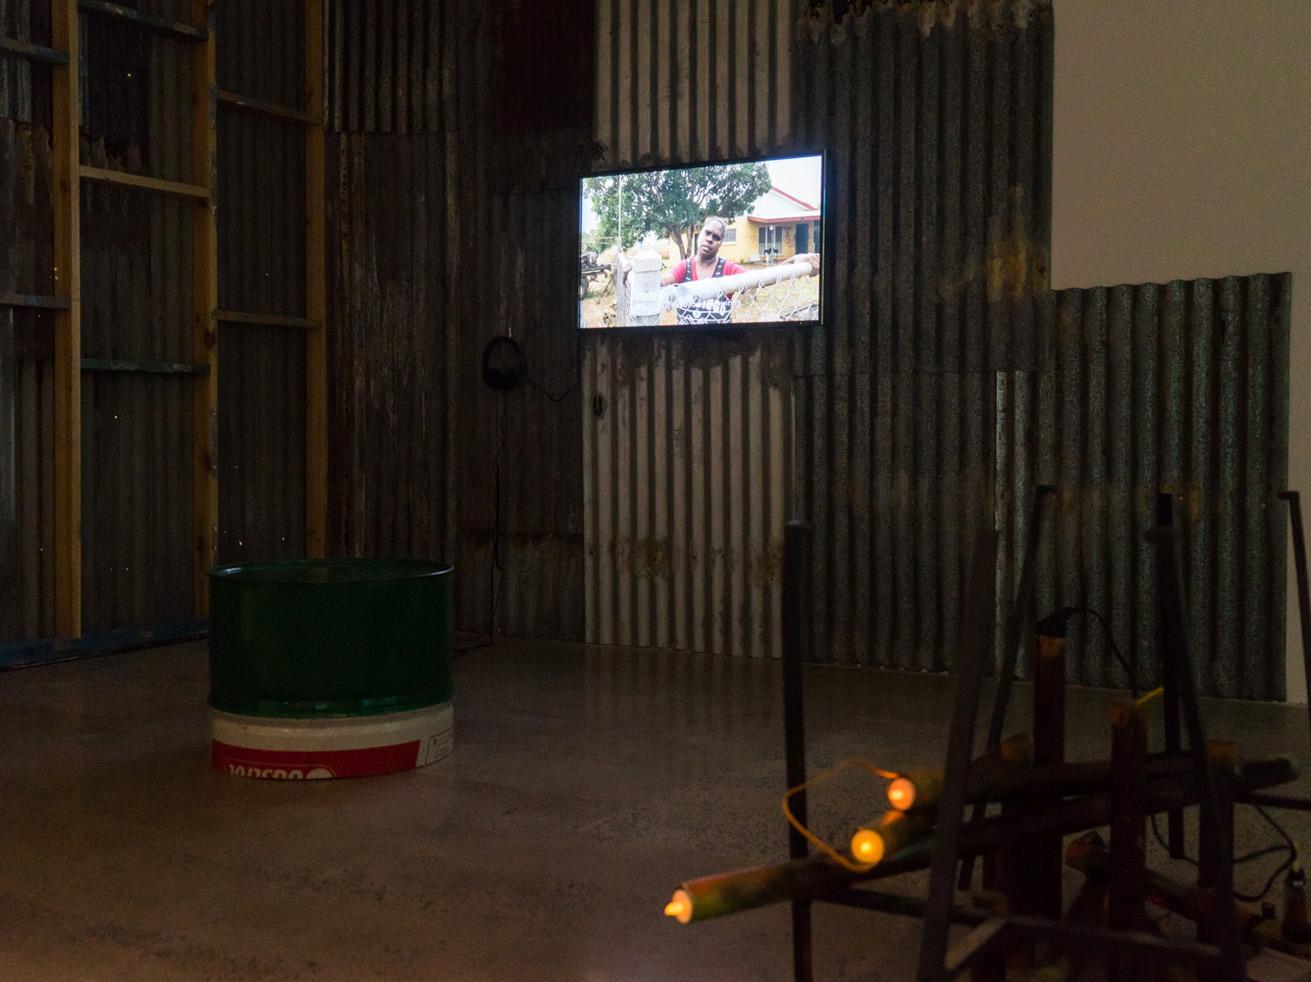 Karrabing Film Collective_Installation view IMA Brisbane_Wutharr Saltwater Dreams_Campfire_Photo_Louis Lim